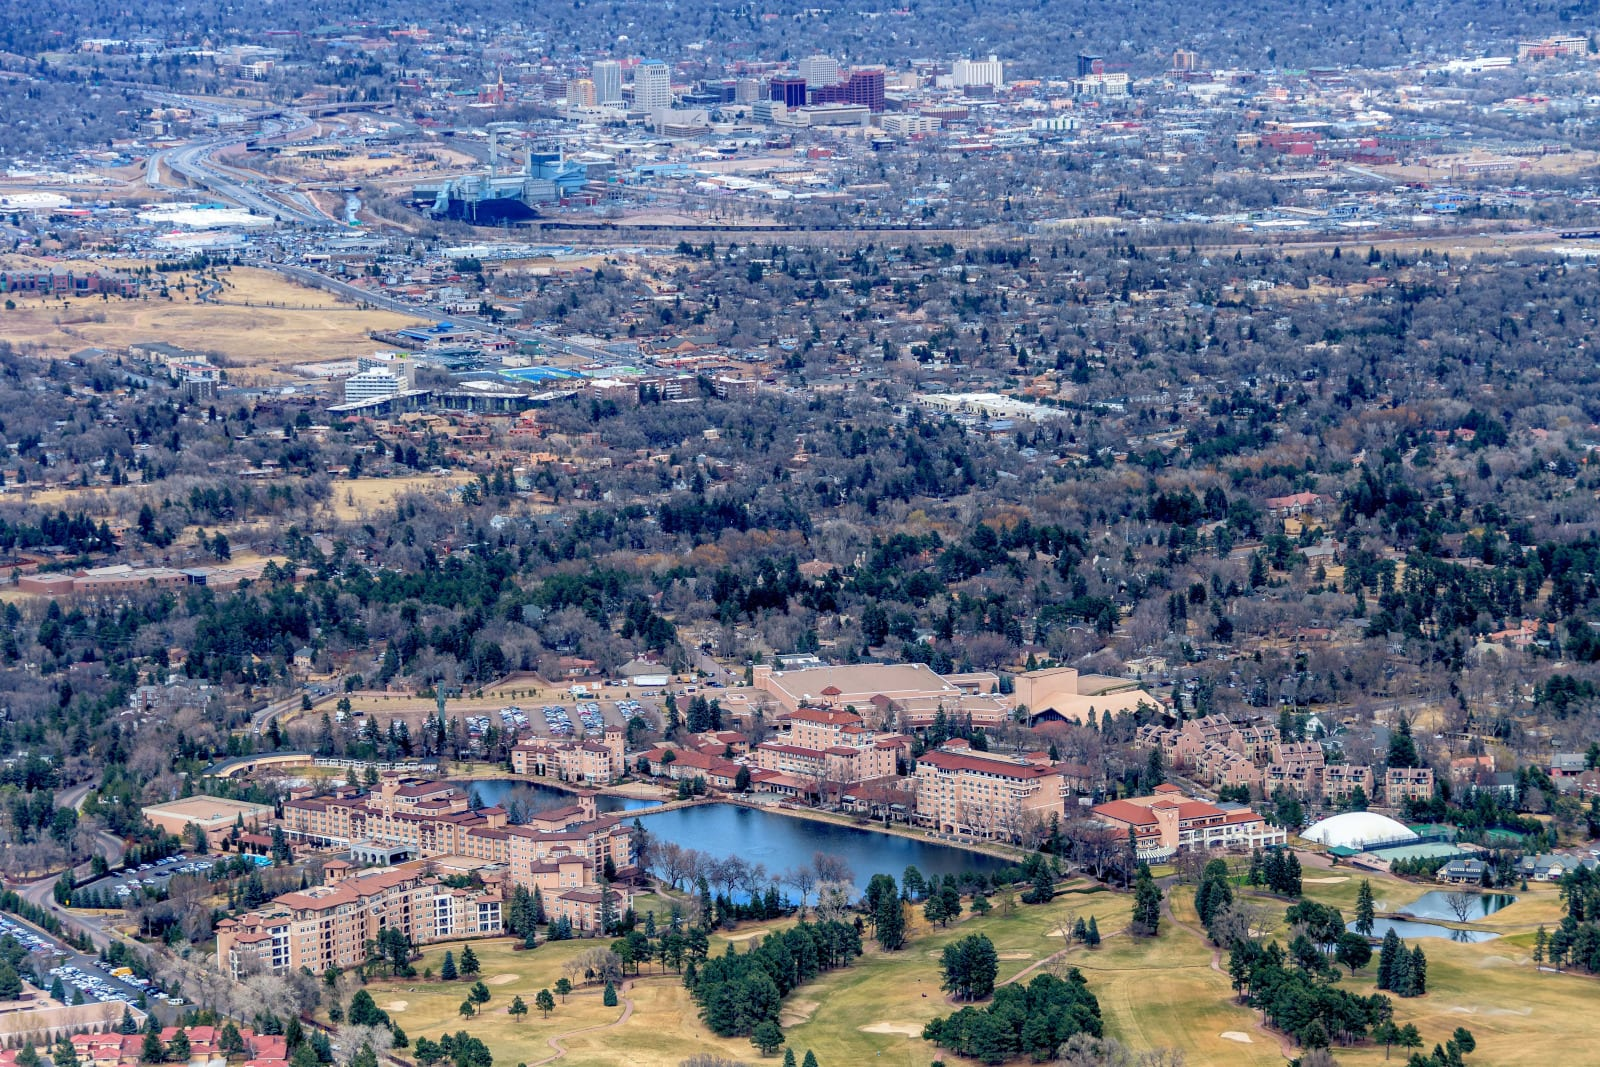 Colorado Springs Neighborhoods Aerial View from Shrine of the Sun